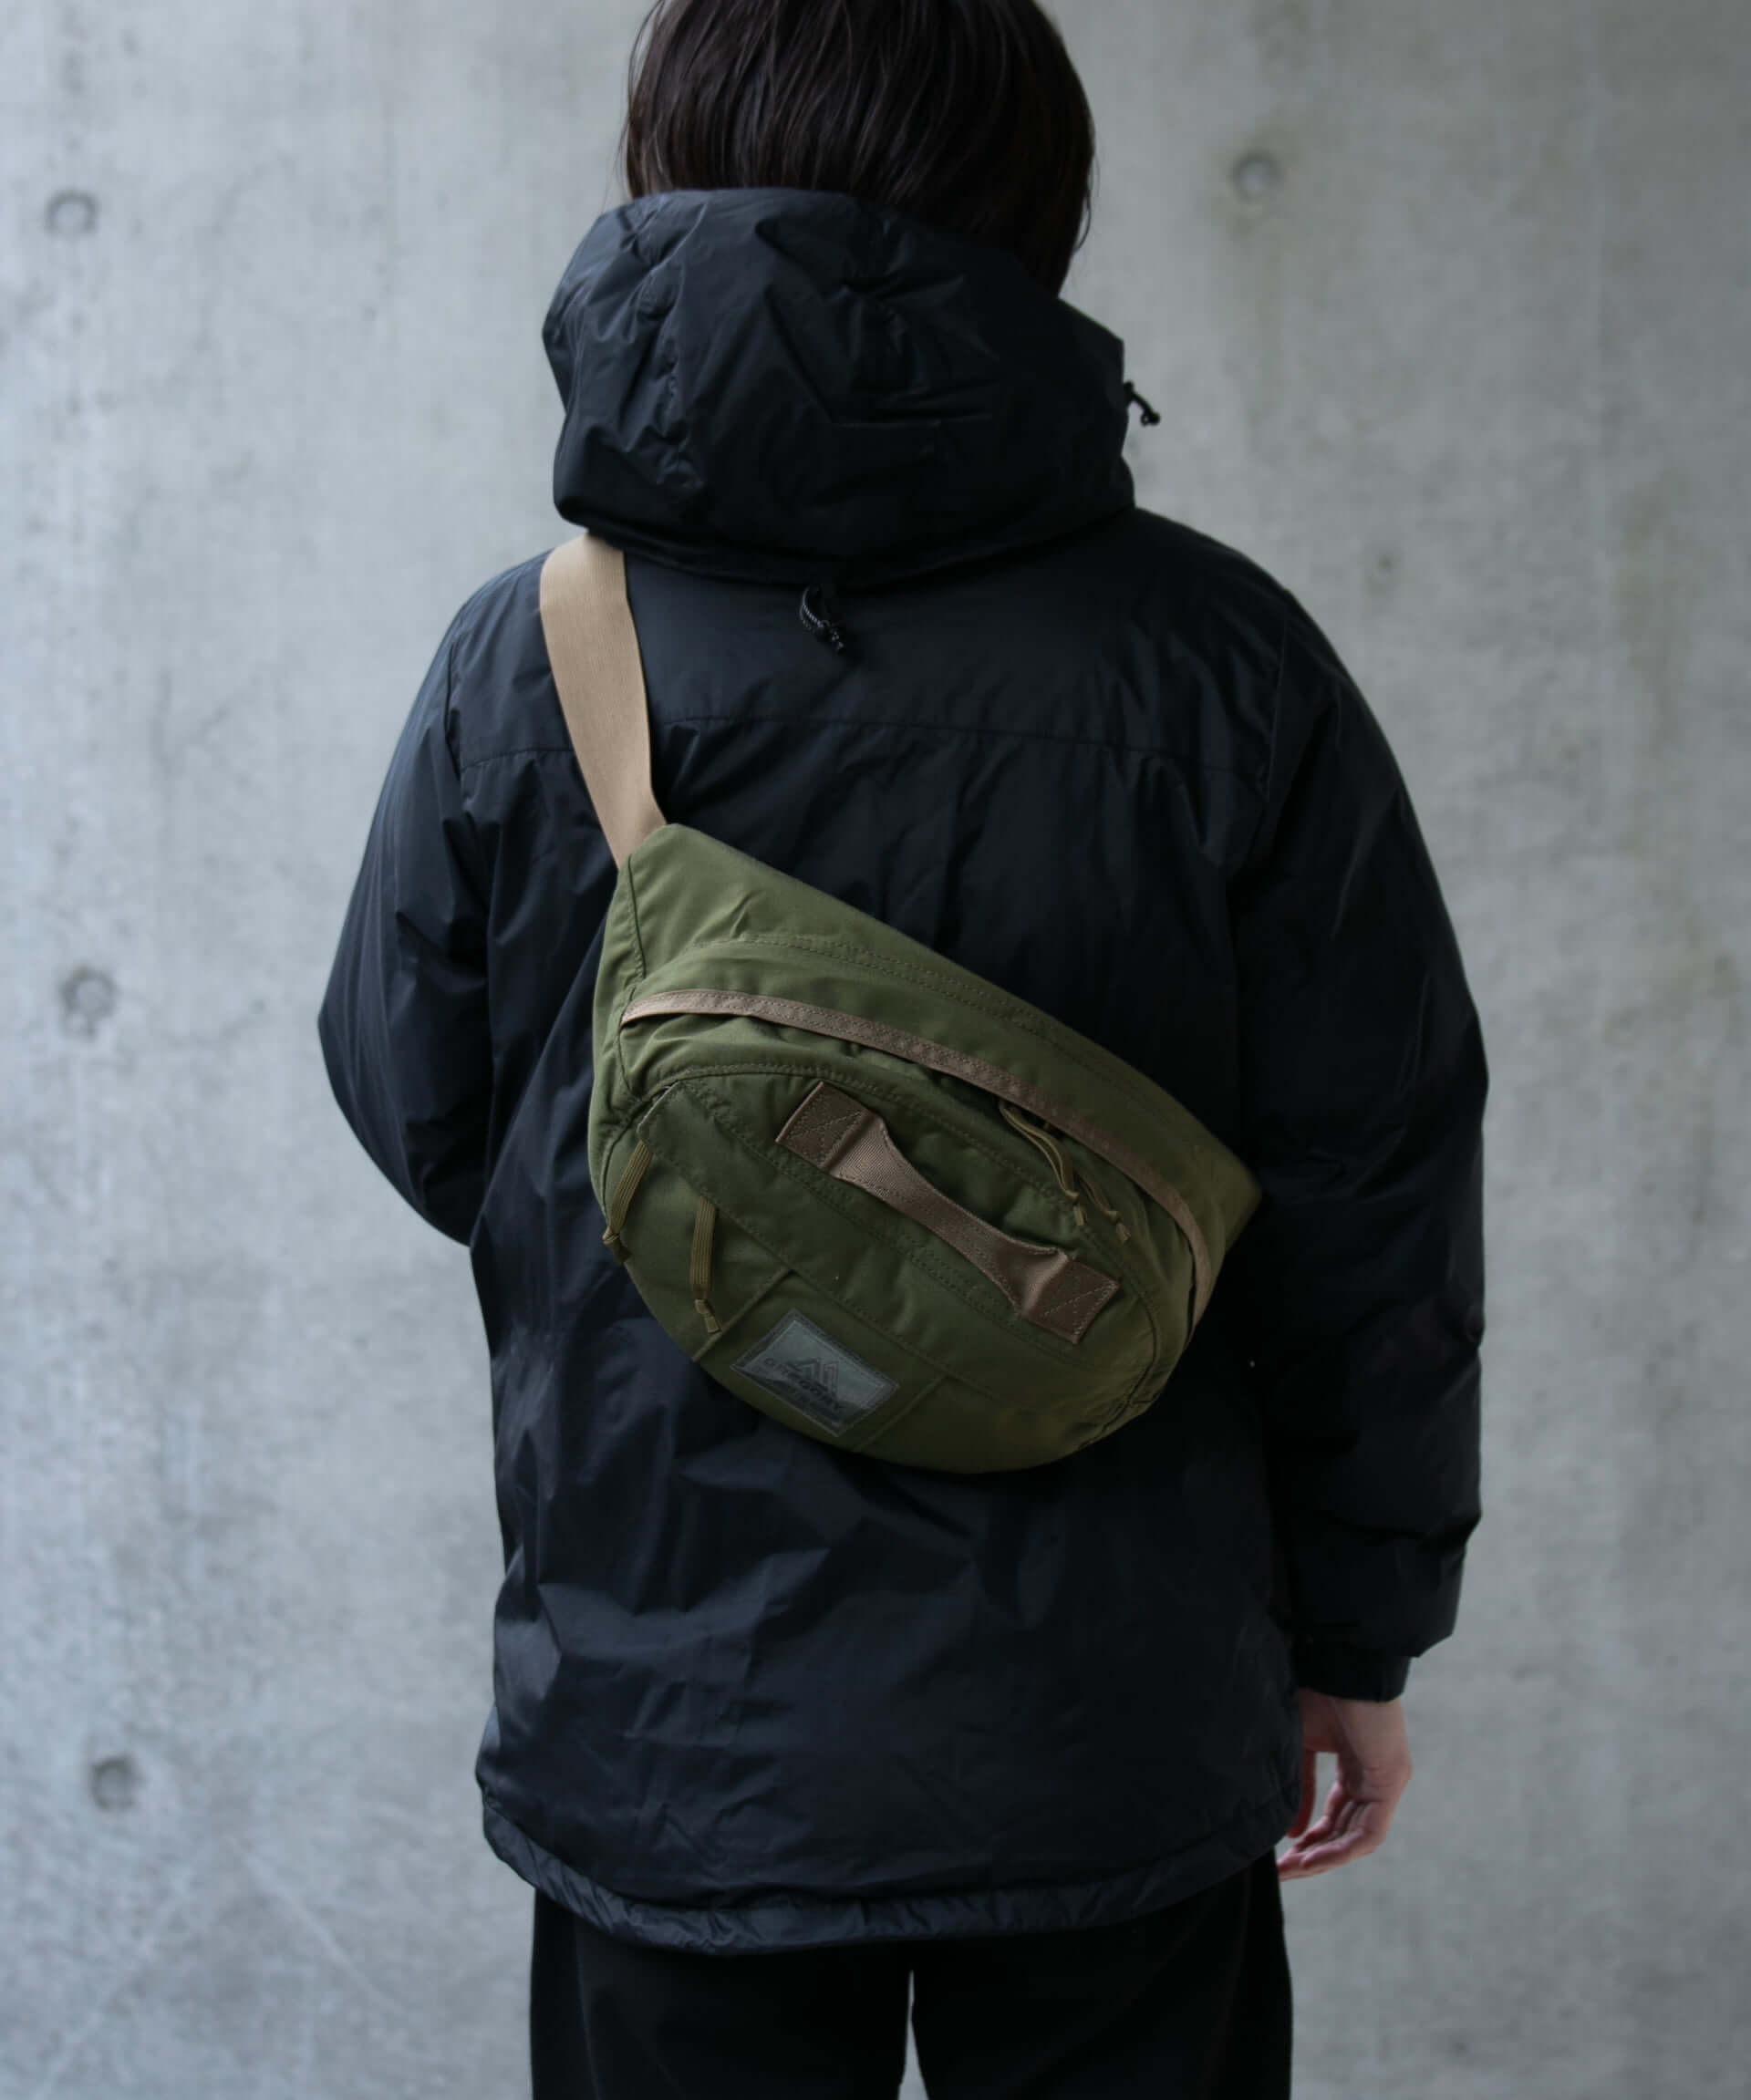 GREGORYとNEXUSVII.による特別コレクション「MILITARY PACK」に新作が登場!巾着型バッグ、ウエストバッグが数量限定で発売決定 lf210113_militarypack_1-1920x2303